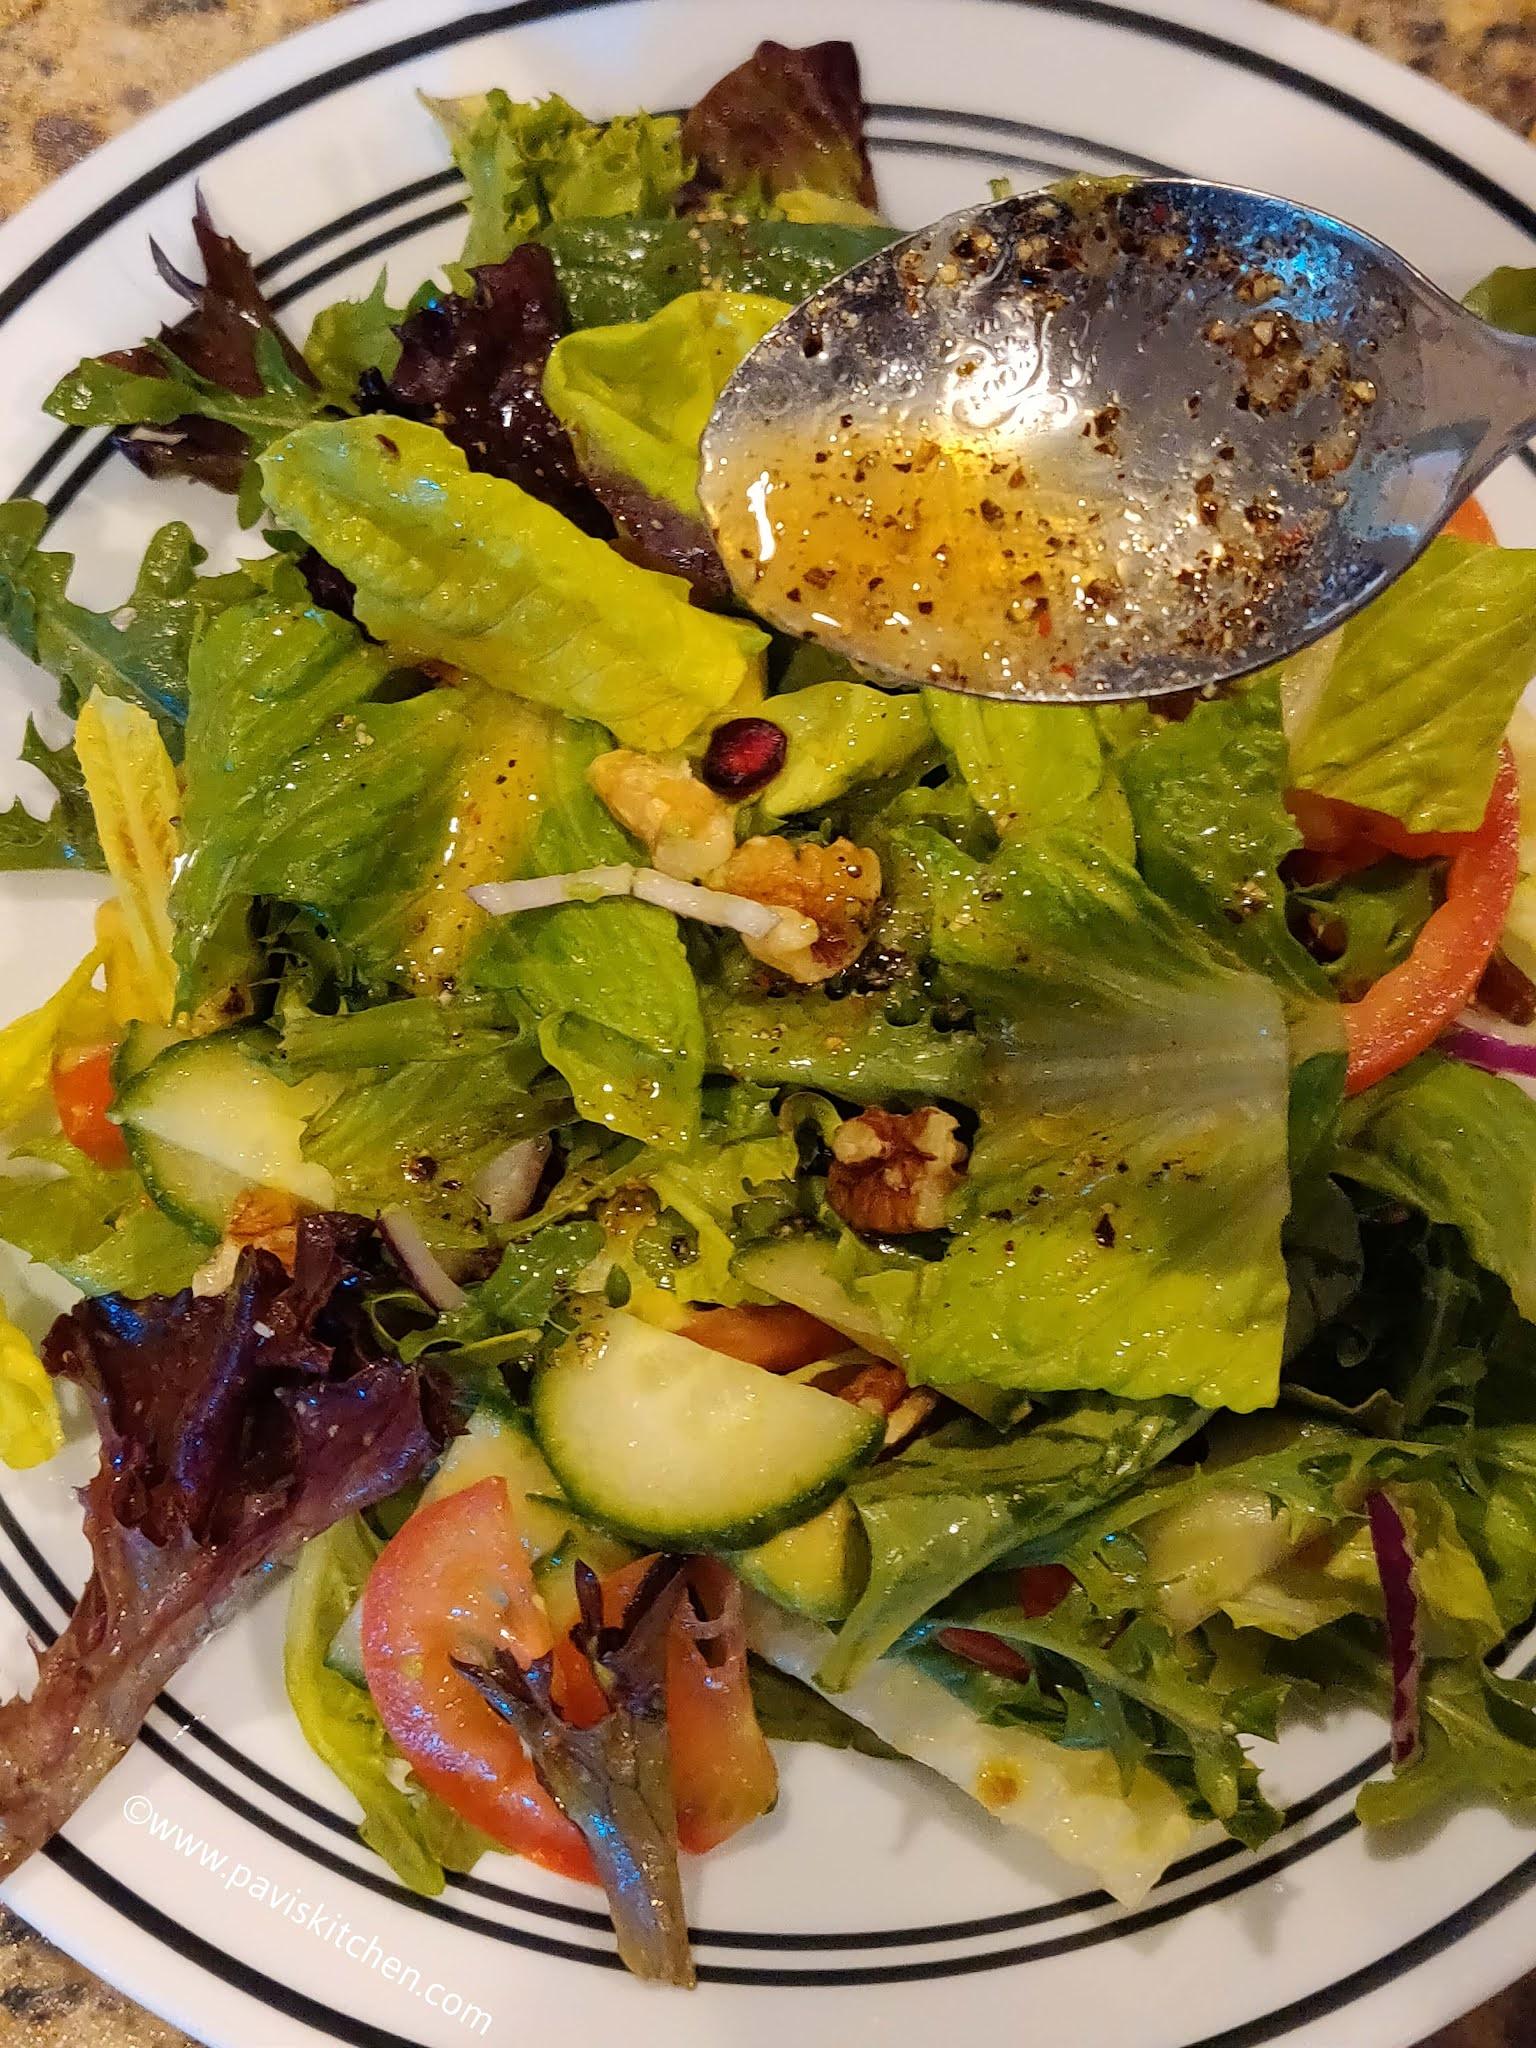 Mixed vegetable salad recipe   Indian chopped salad   Green salad recipe